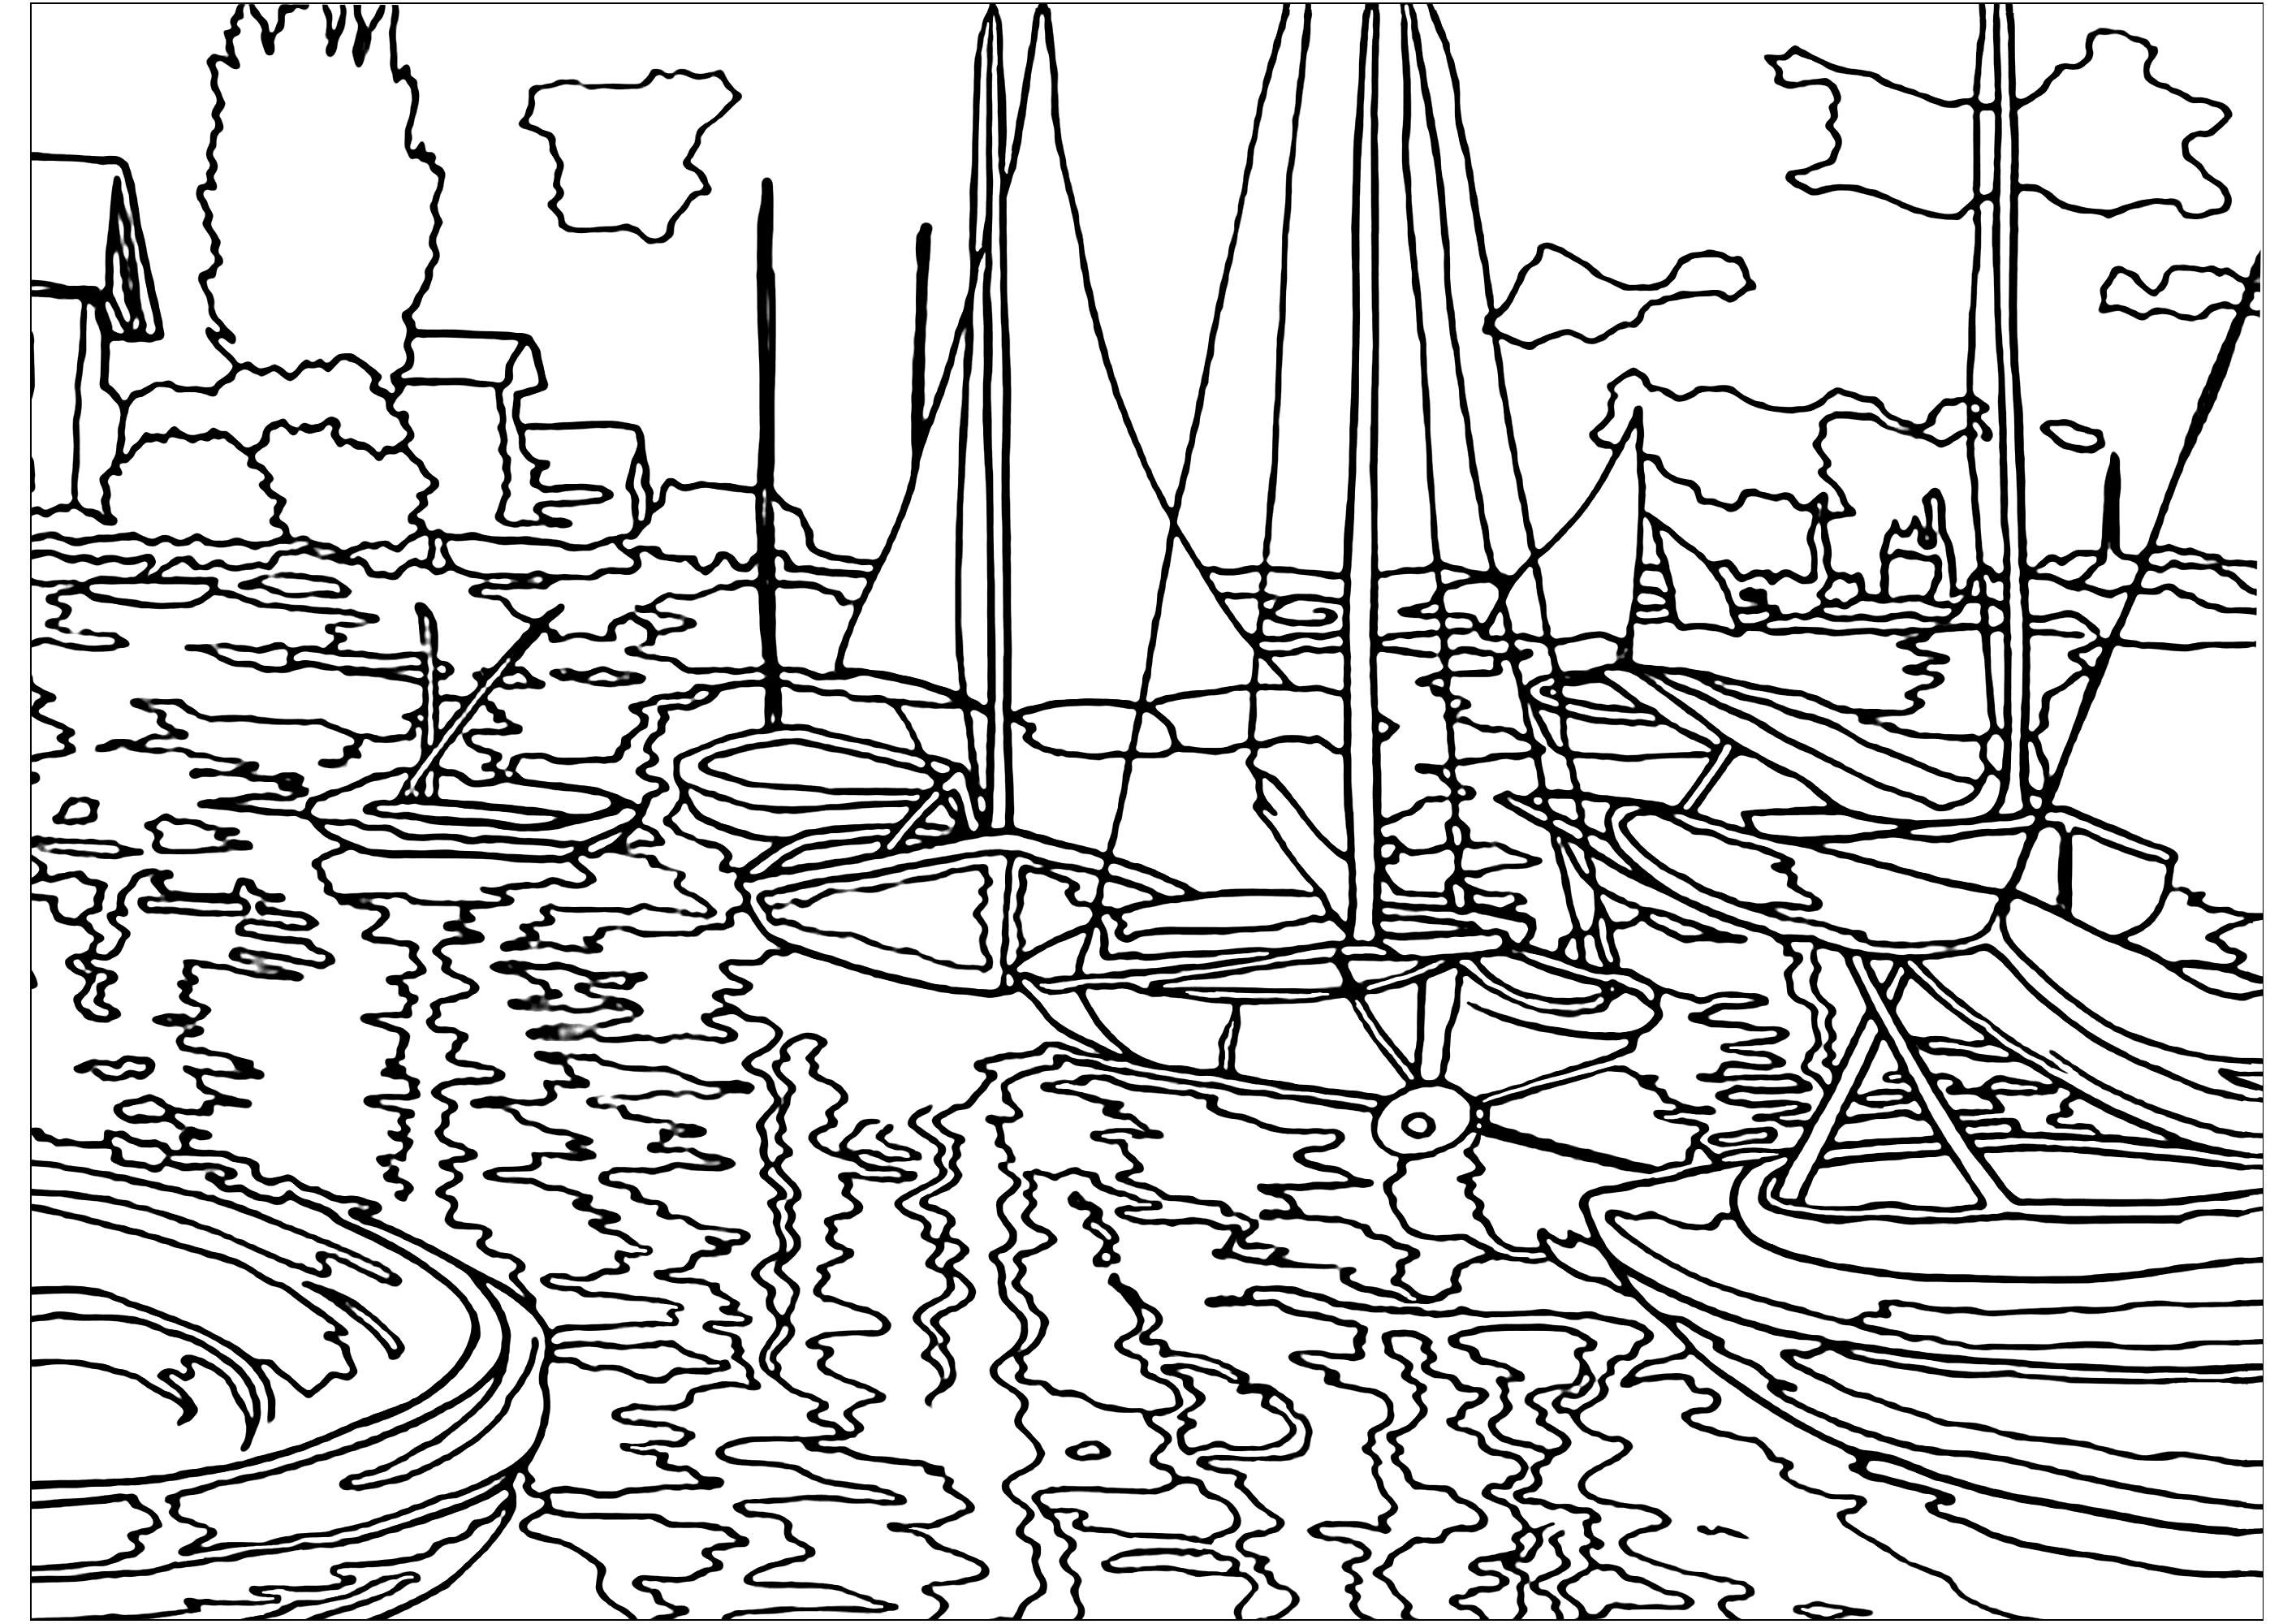 Disegni da Colorare per Adulti : Opera d arte - 4